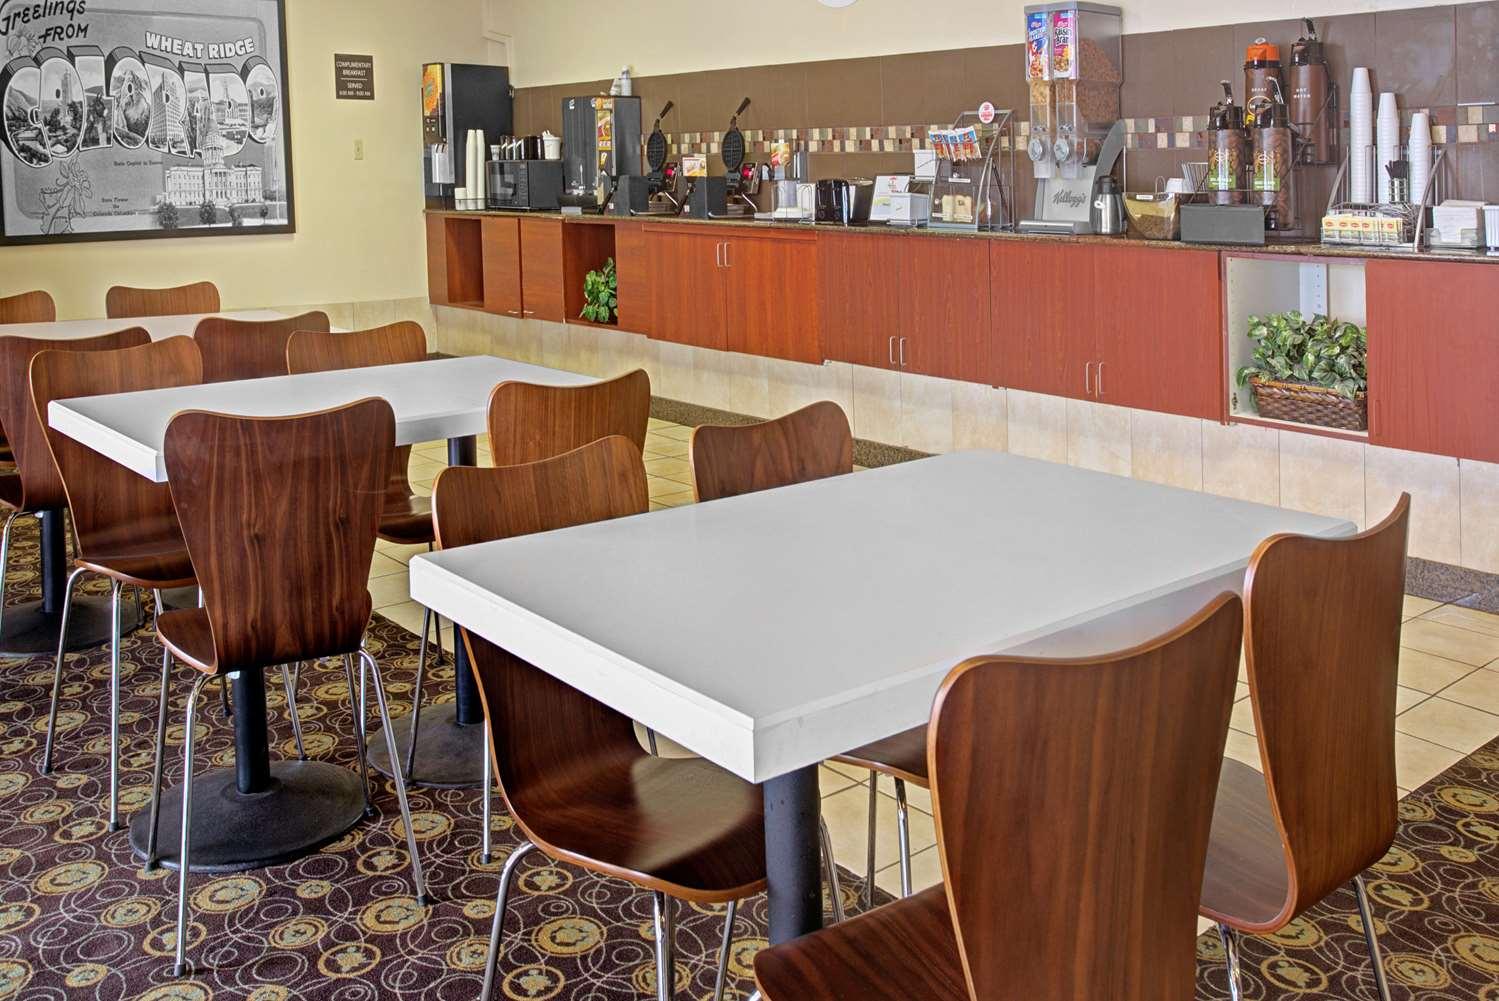 proam - Super 8 Motel Wheat Ridge